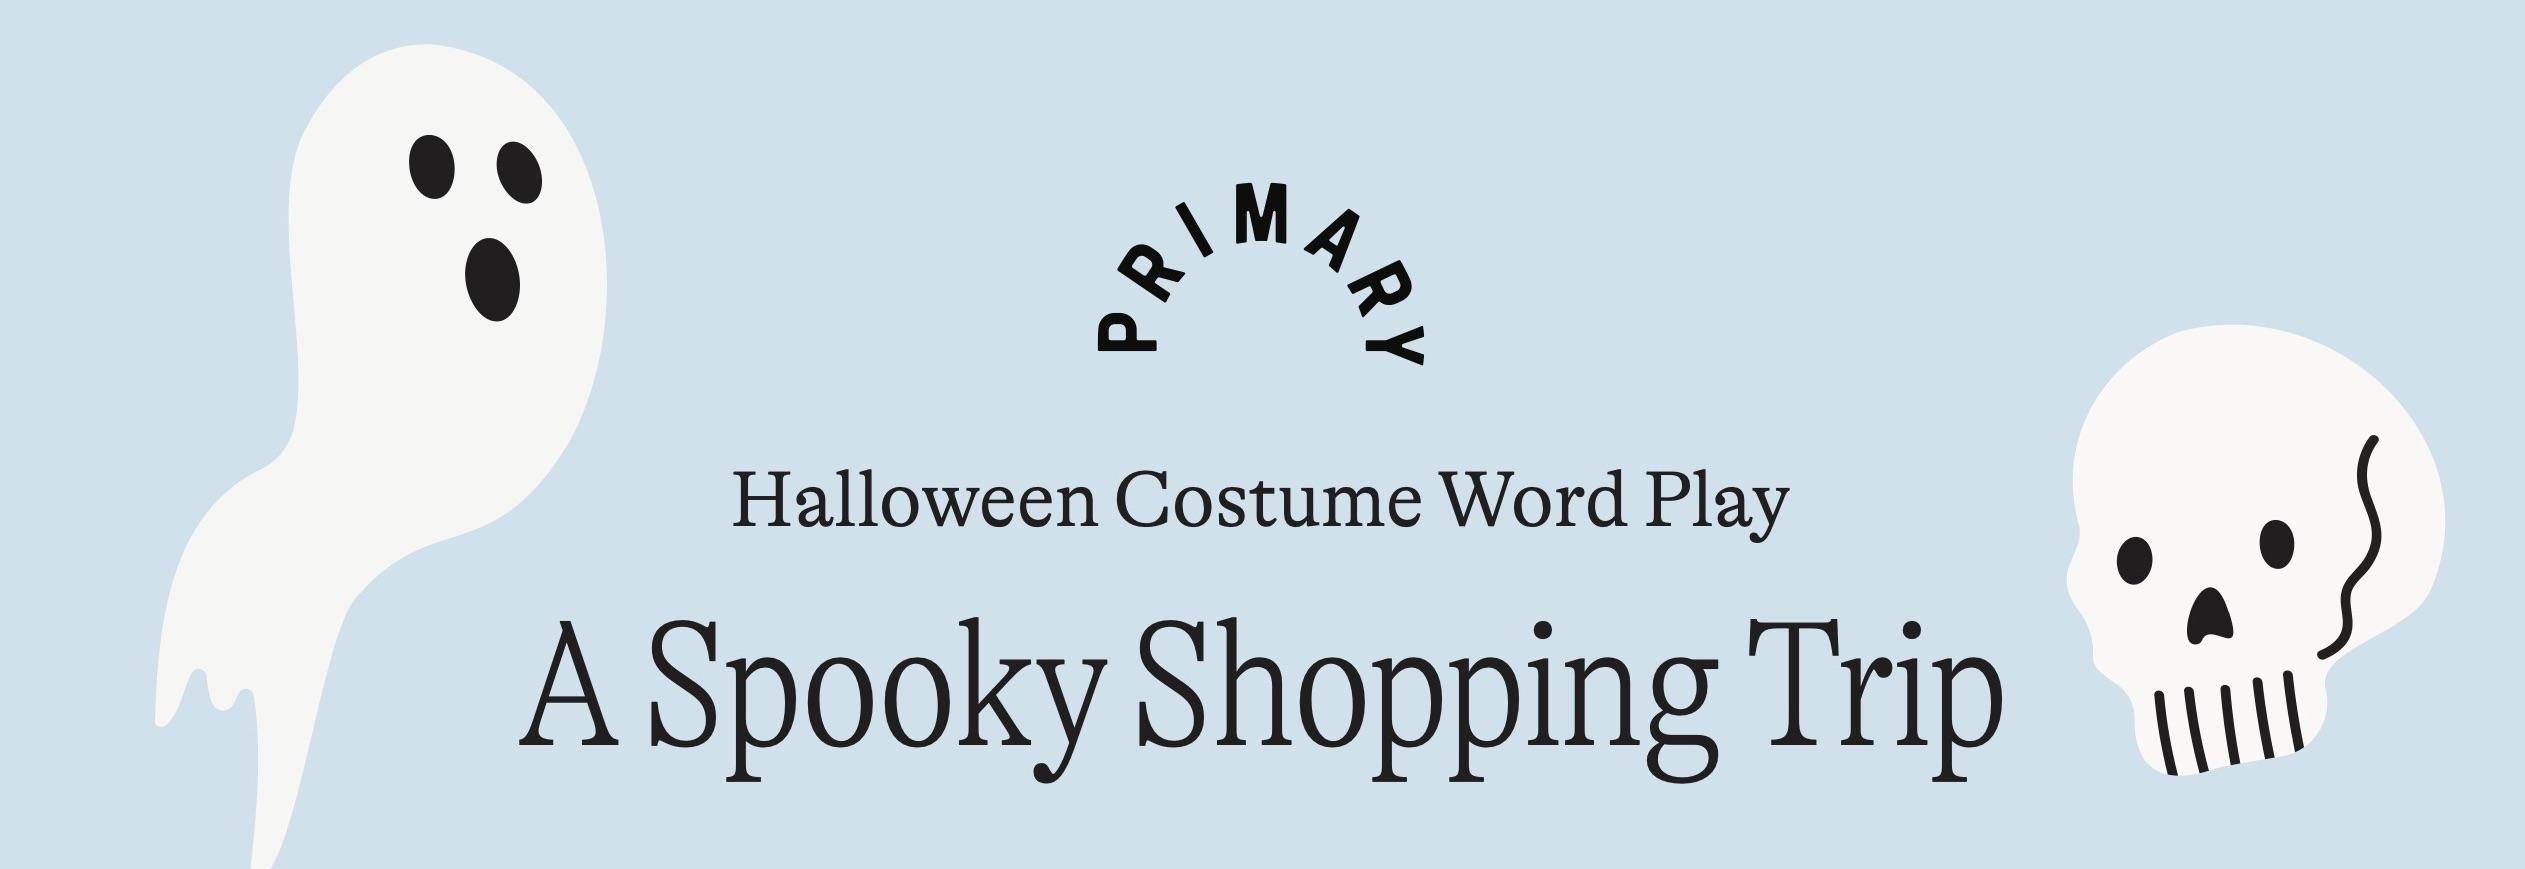 A Spooky Shopping Trip jpeg.jpg